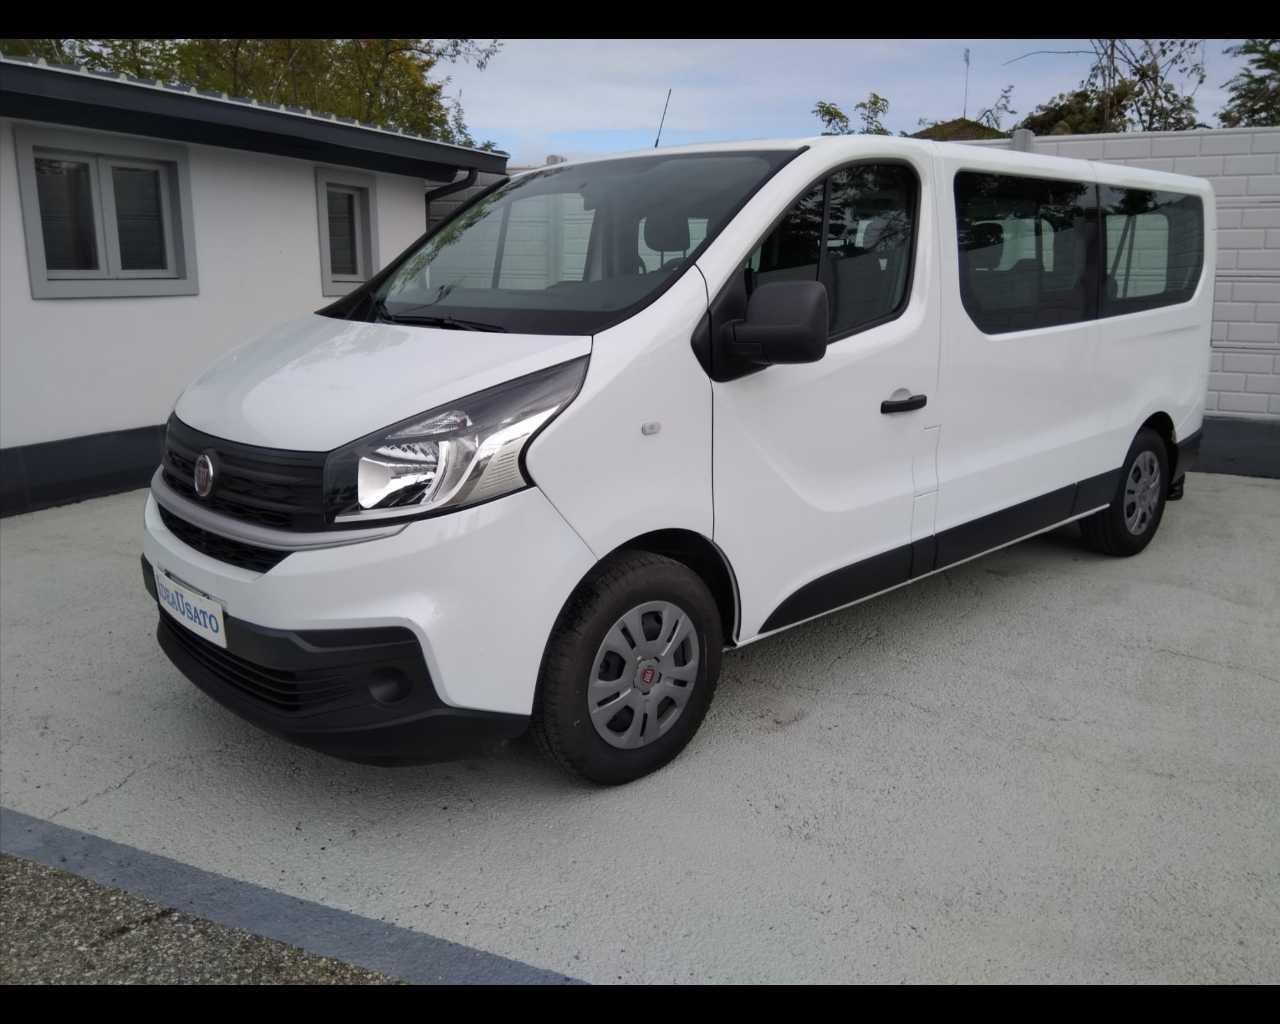 FIAT  1.6 mjt LH1 12Q 120cv combi M1 E6c, Diesel, €18.900 - Talento 2020 (16) - 1.6 Mjt Lh1 12q 120cv Combi M1 E6c